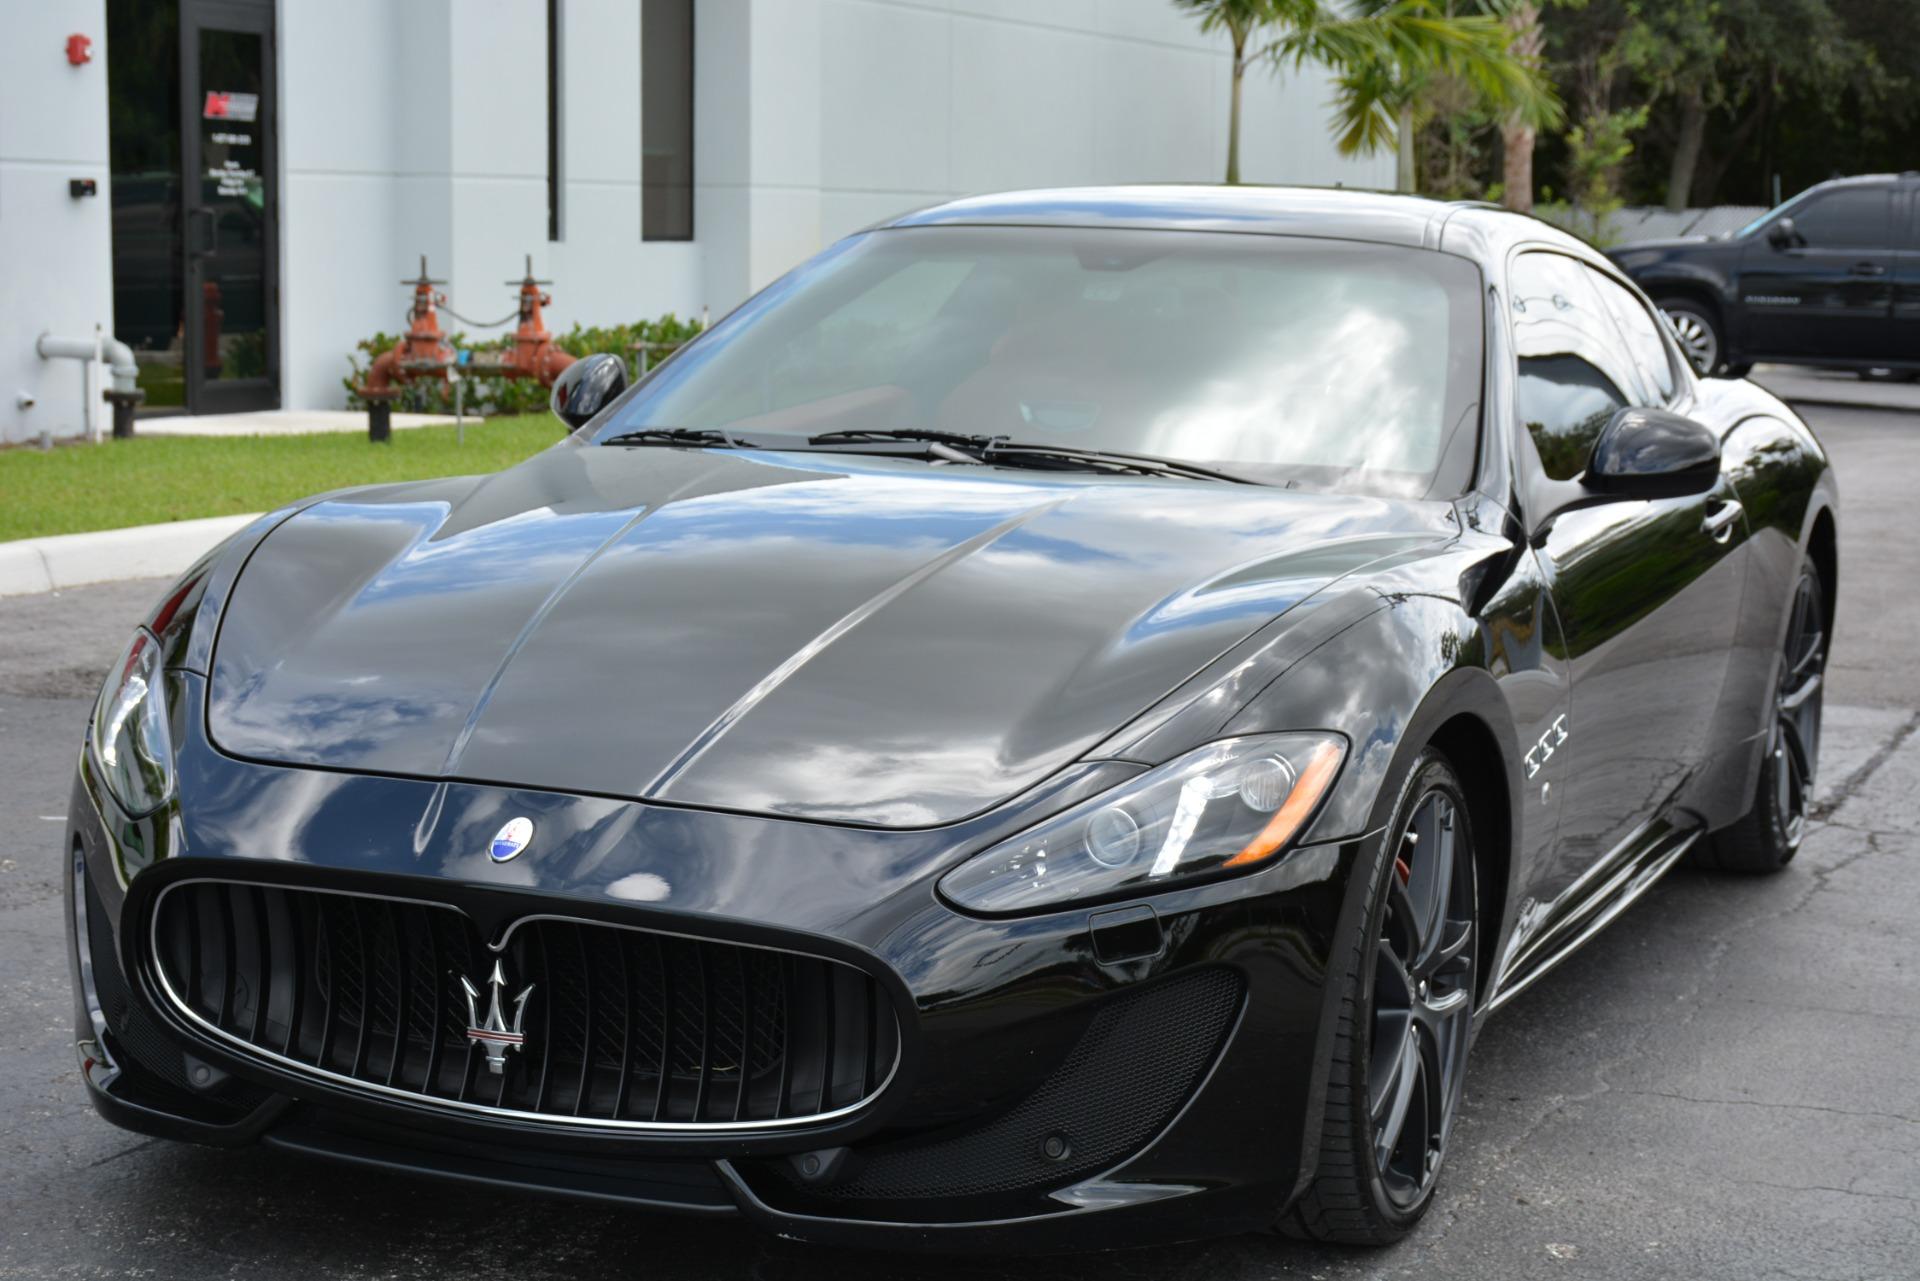 Used 2017 Maserati GranTurismo Sport For Sale ($84,900)   Marino Performance Motors Stock #218485